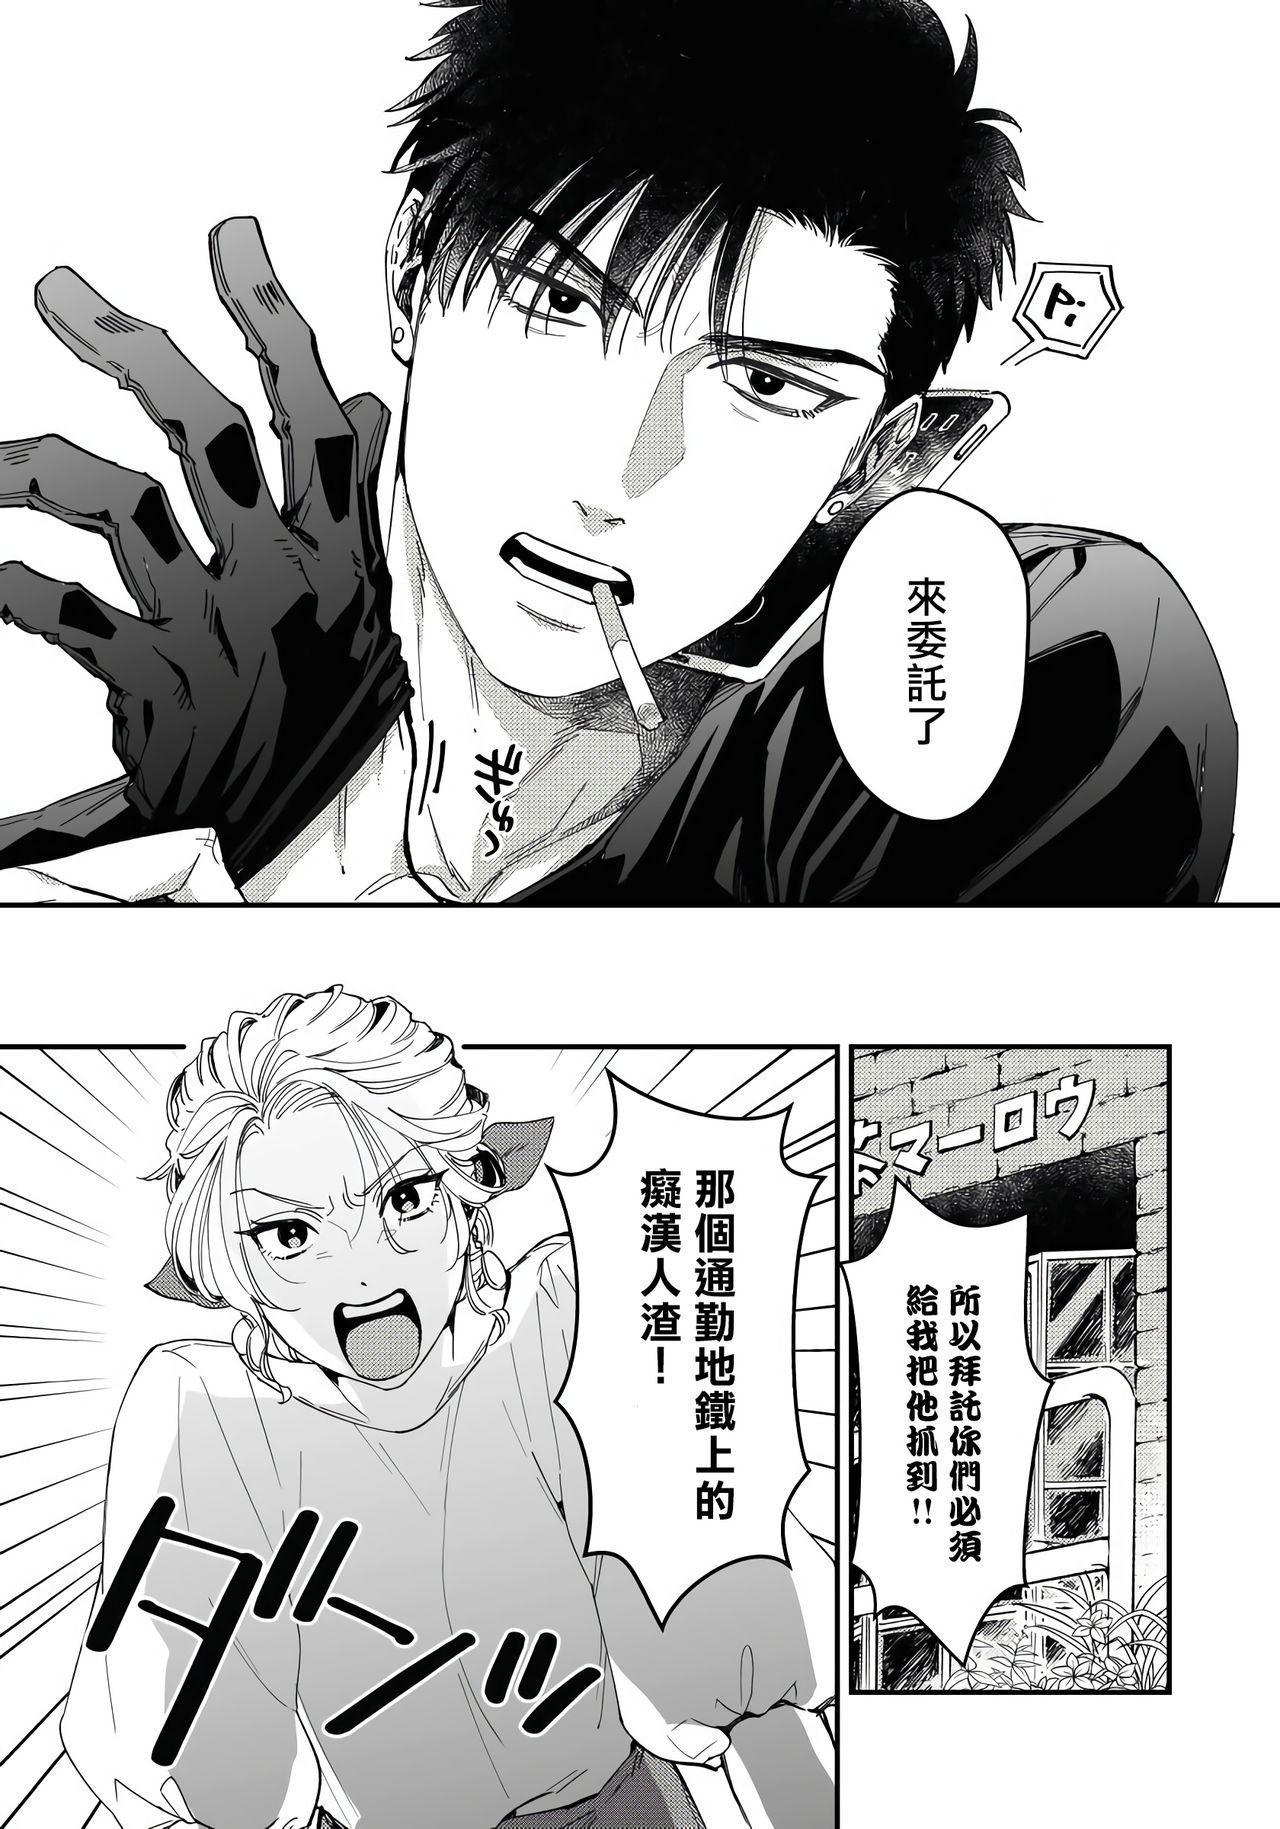 Kokomade Yarutoha Kiitenai! |之前可没听说要做到这个份上啊! 1-3 4